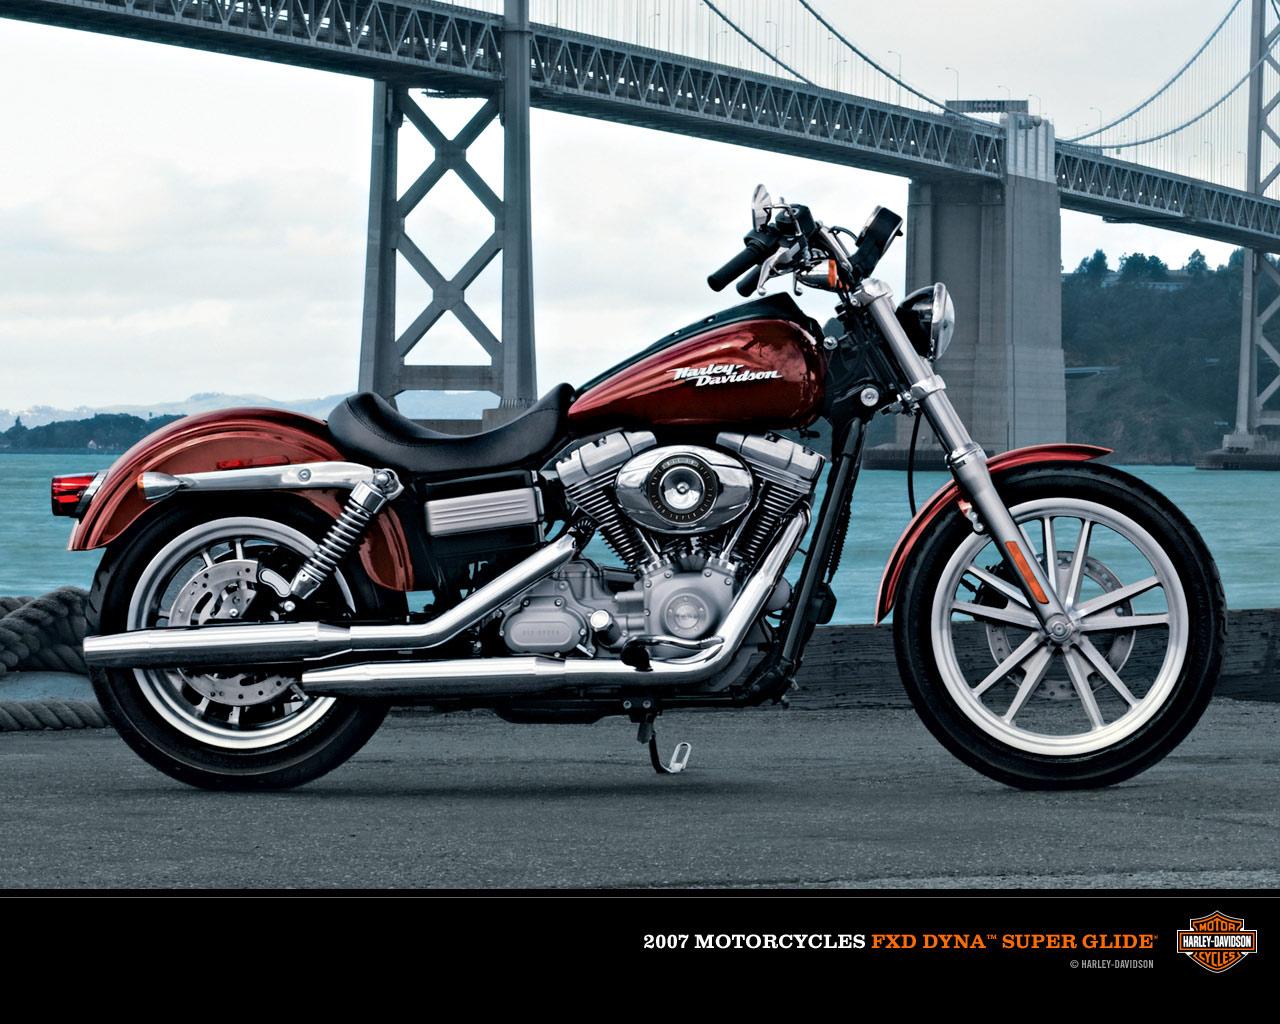 http://4.bp.blogspot.com/-8QVd3ooDhDU/UDDmVNUoYdI/AAAAAAAACvQ/lOWceRokPmI/s1600/Harley-Davidson_FXD_Dyna_Super_Glide.jpg